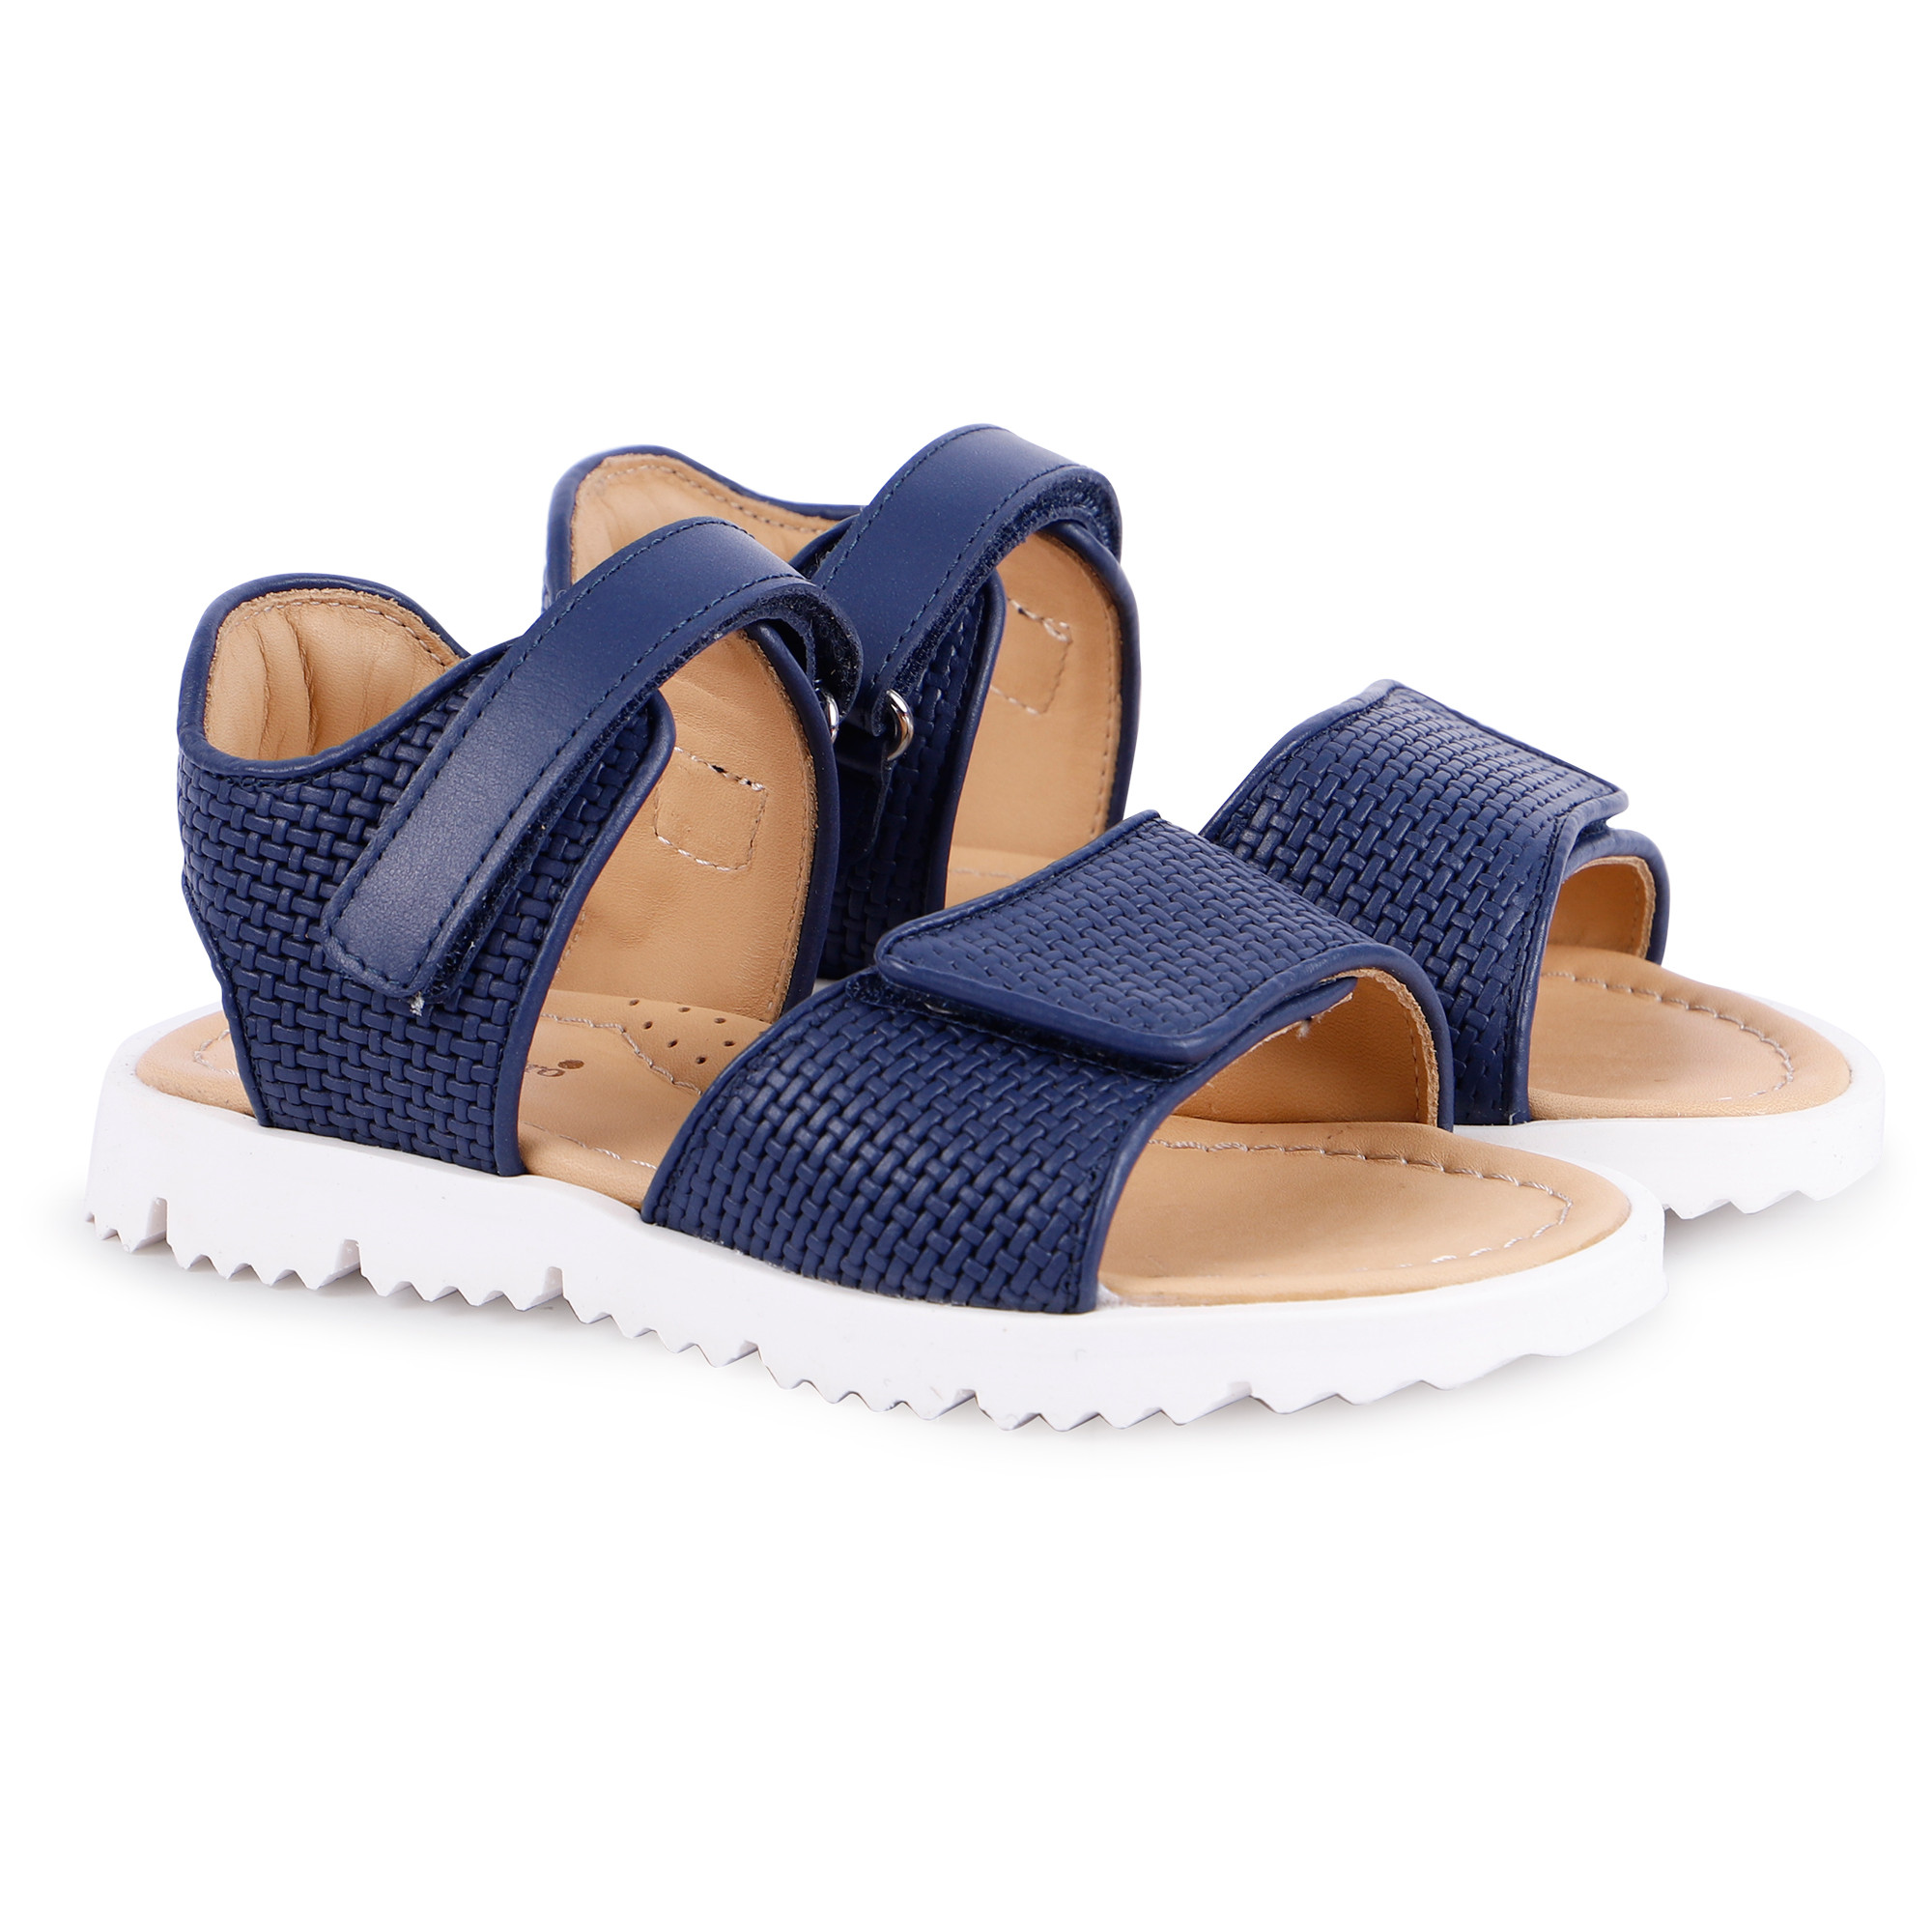 Zecchino d'Oro Summer Sandals in Navy